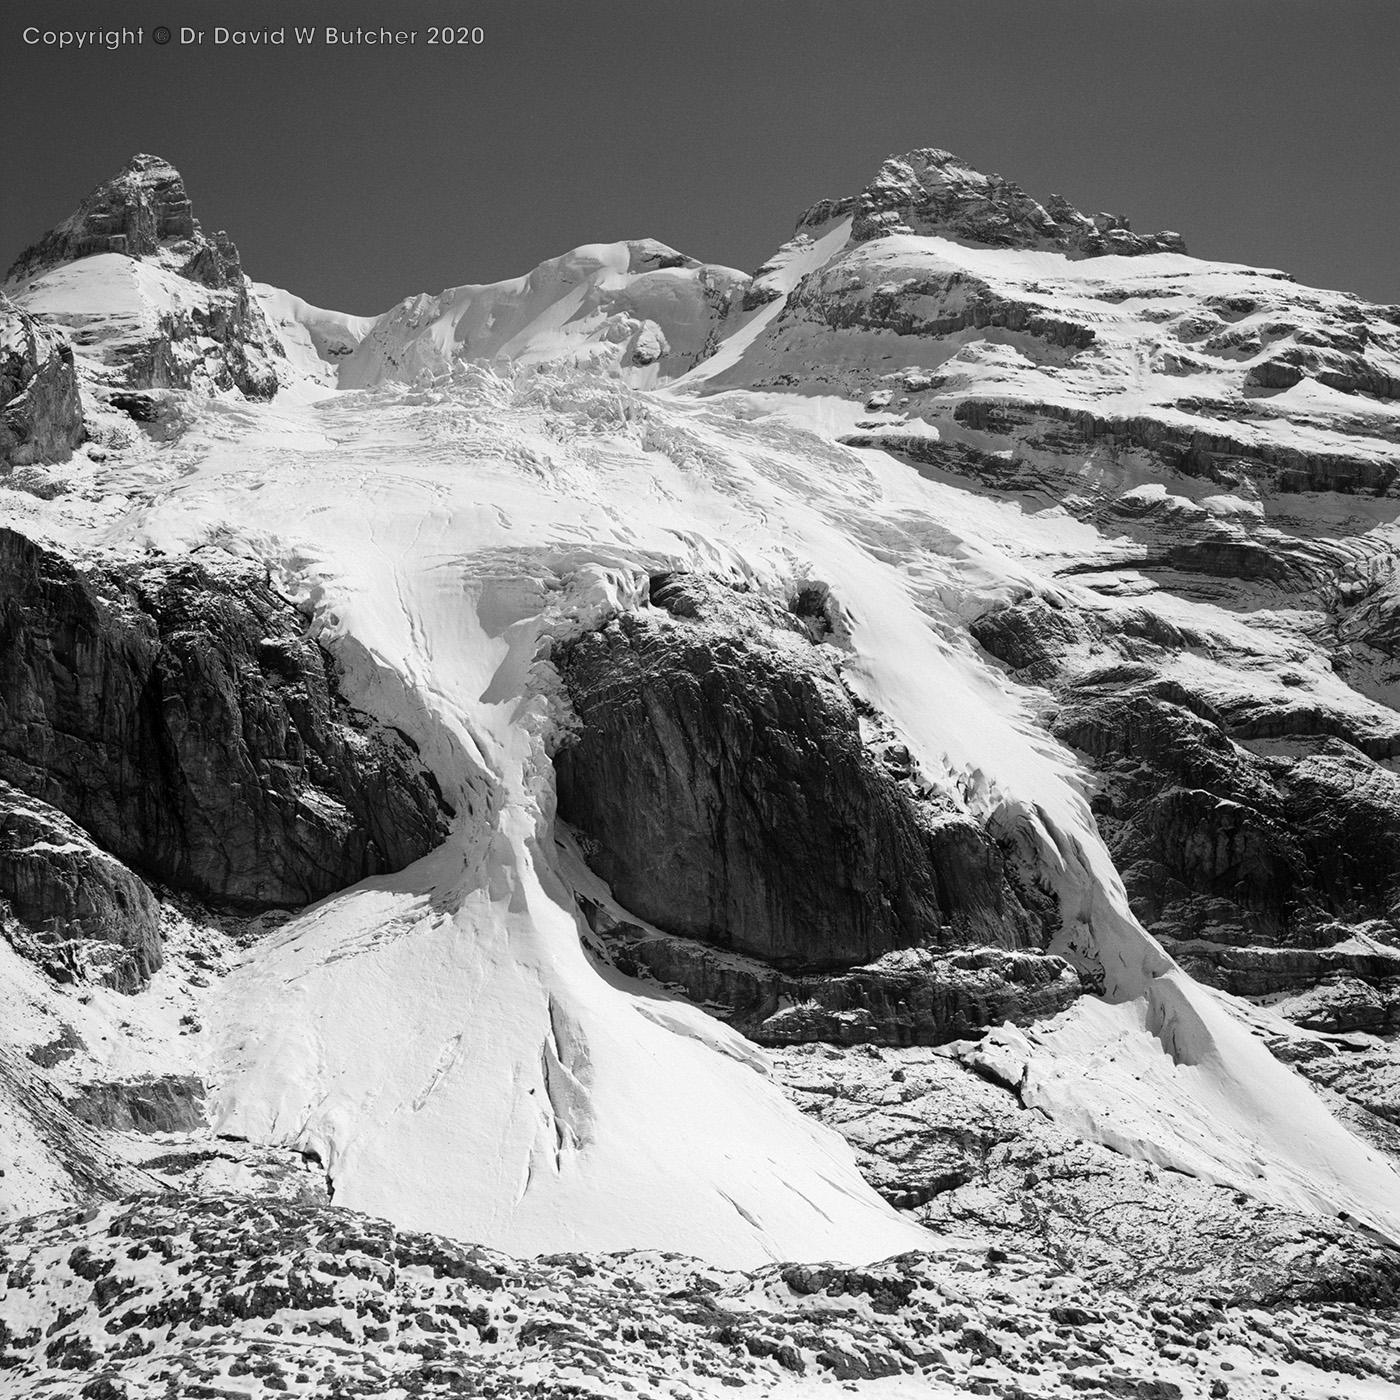 Kandersteg, Blumlisalphorn from Hohturli Descent, Switzerland